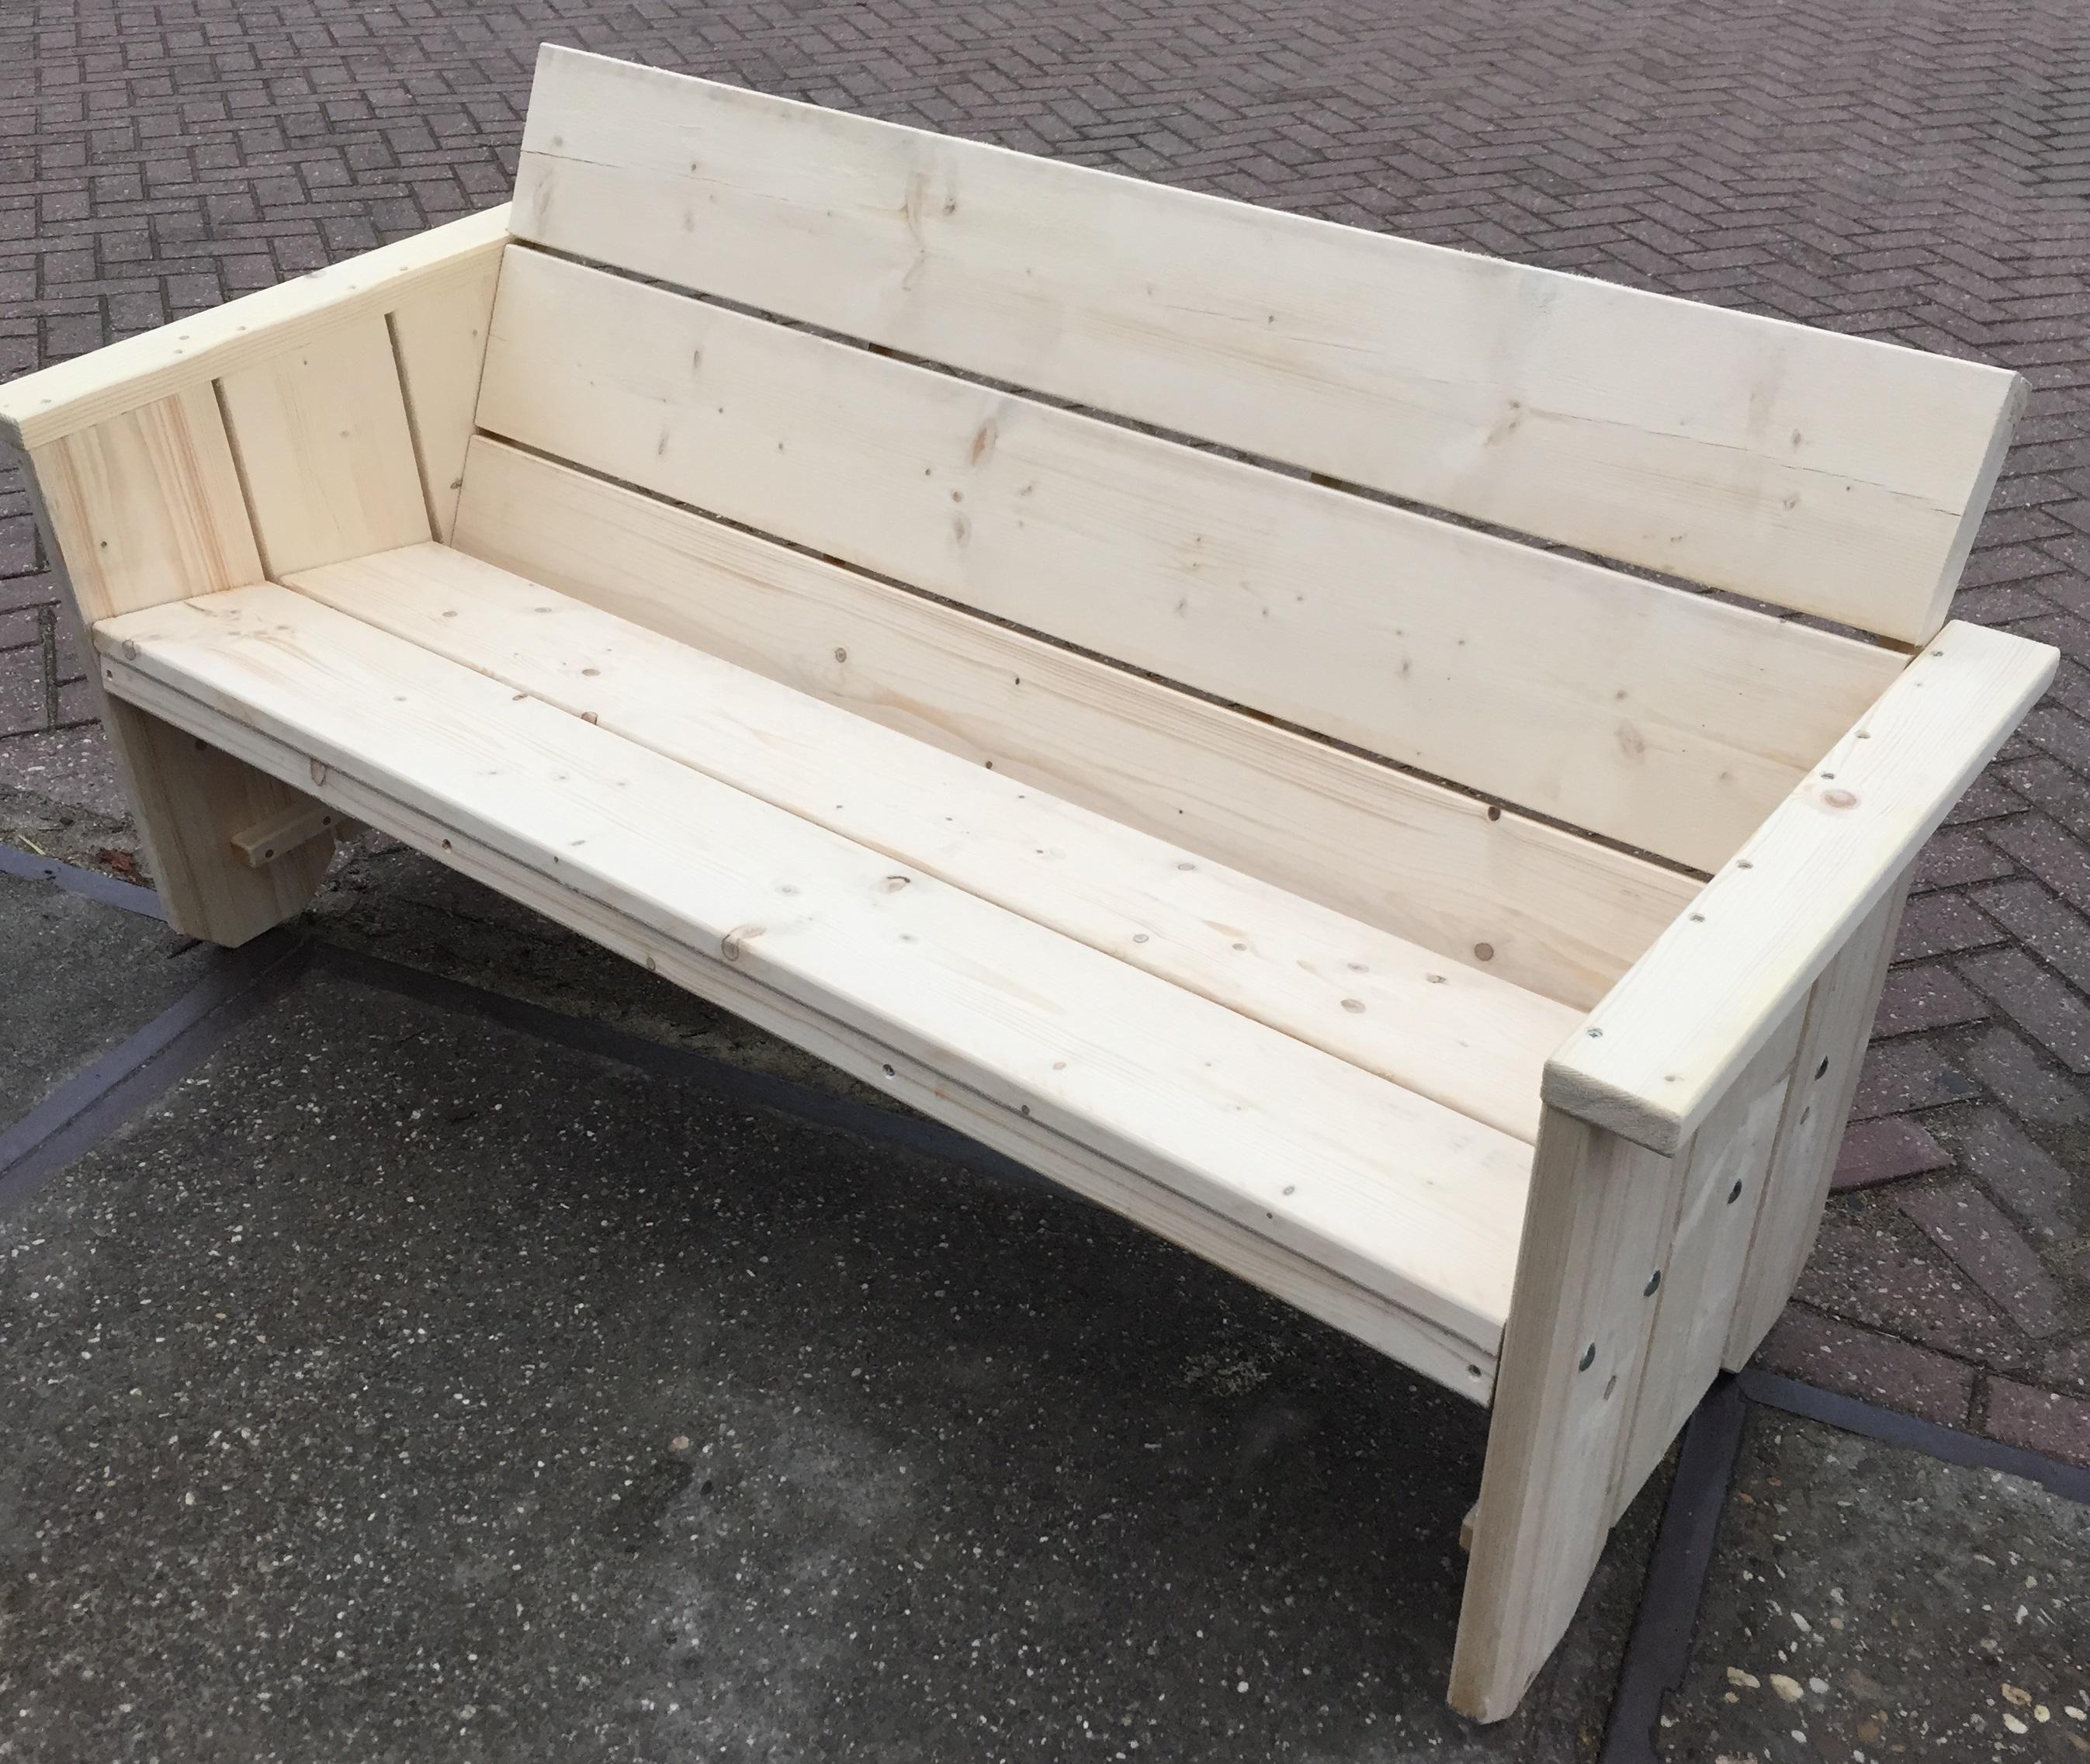 Hoekbank buiten goedkoop teak loungebank hoekbank jakarta loungeset tuinmeubel aanbieding - Buiten image outs ...